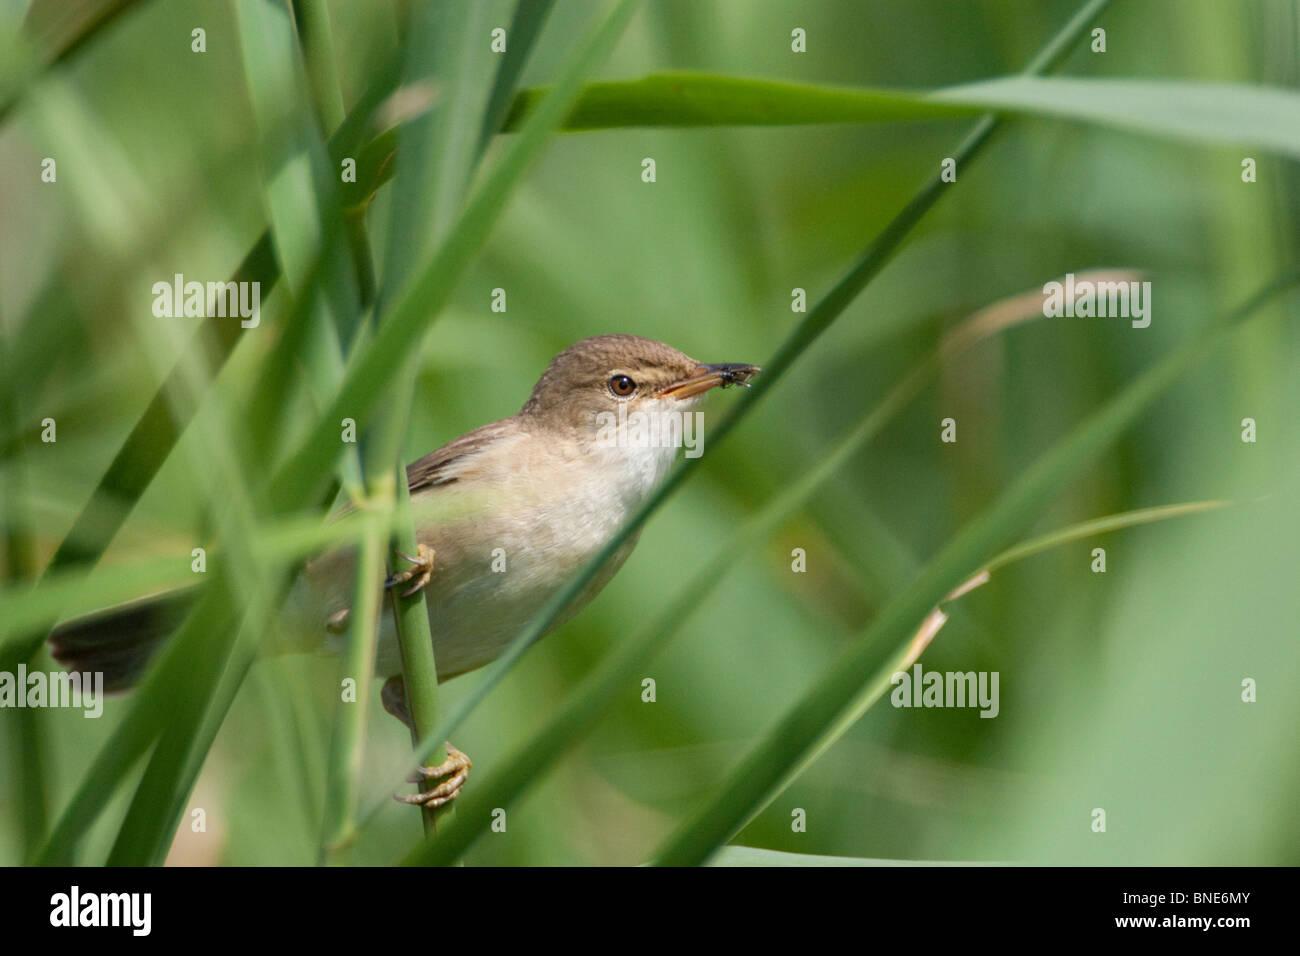 Reed warbler, Acrocephalus scirpaceus. - Stock Image